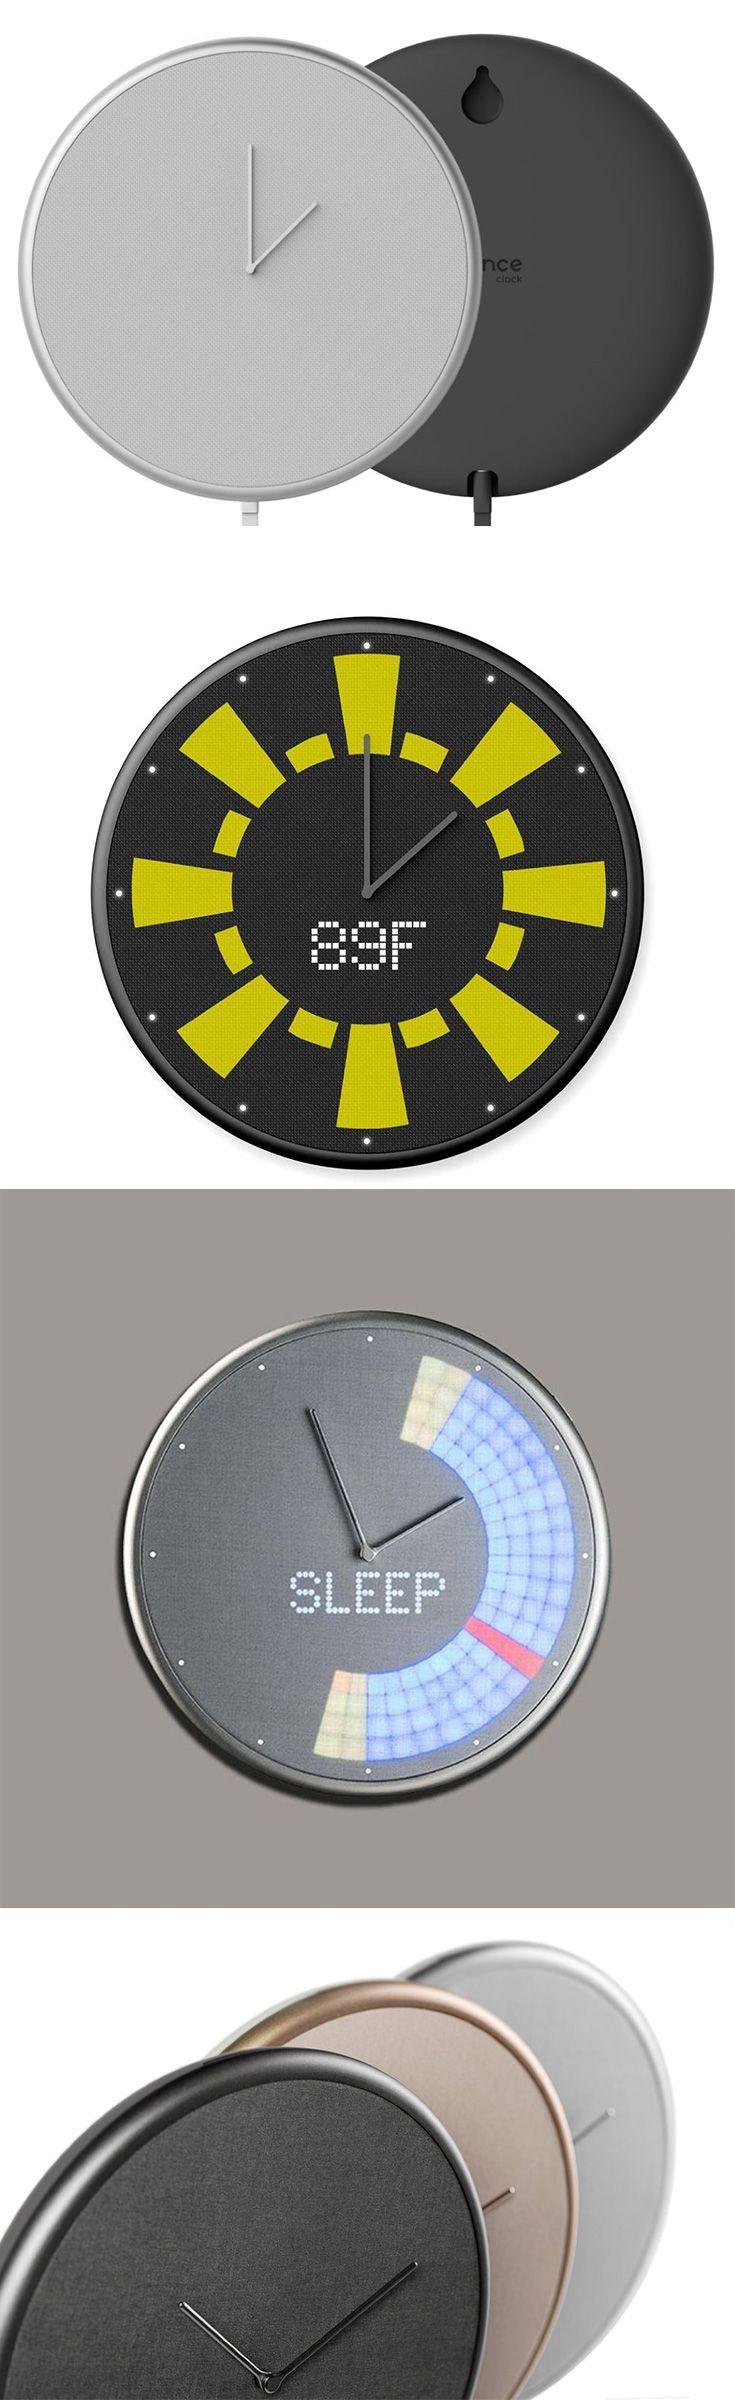 17 Best Ideas About Wall Clock Design On Pinterest